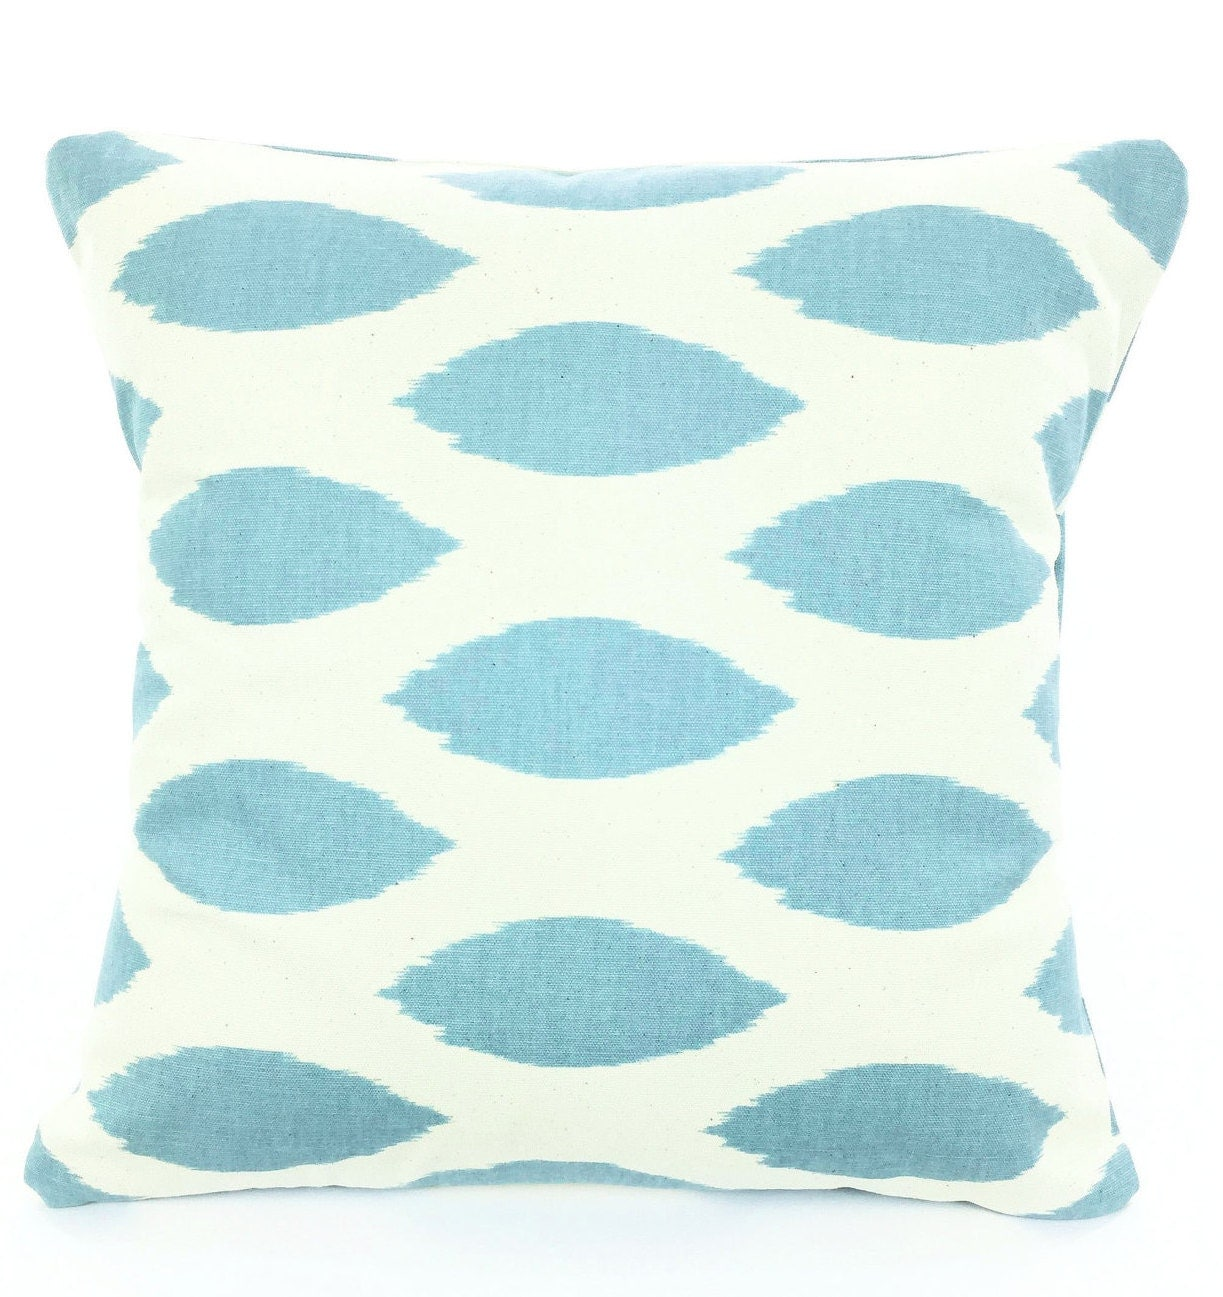 Blue Pillow Covers Decorative Throw Pillows Cushions Village